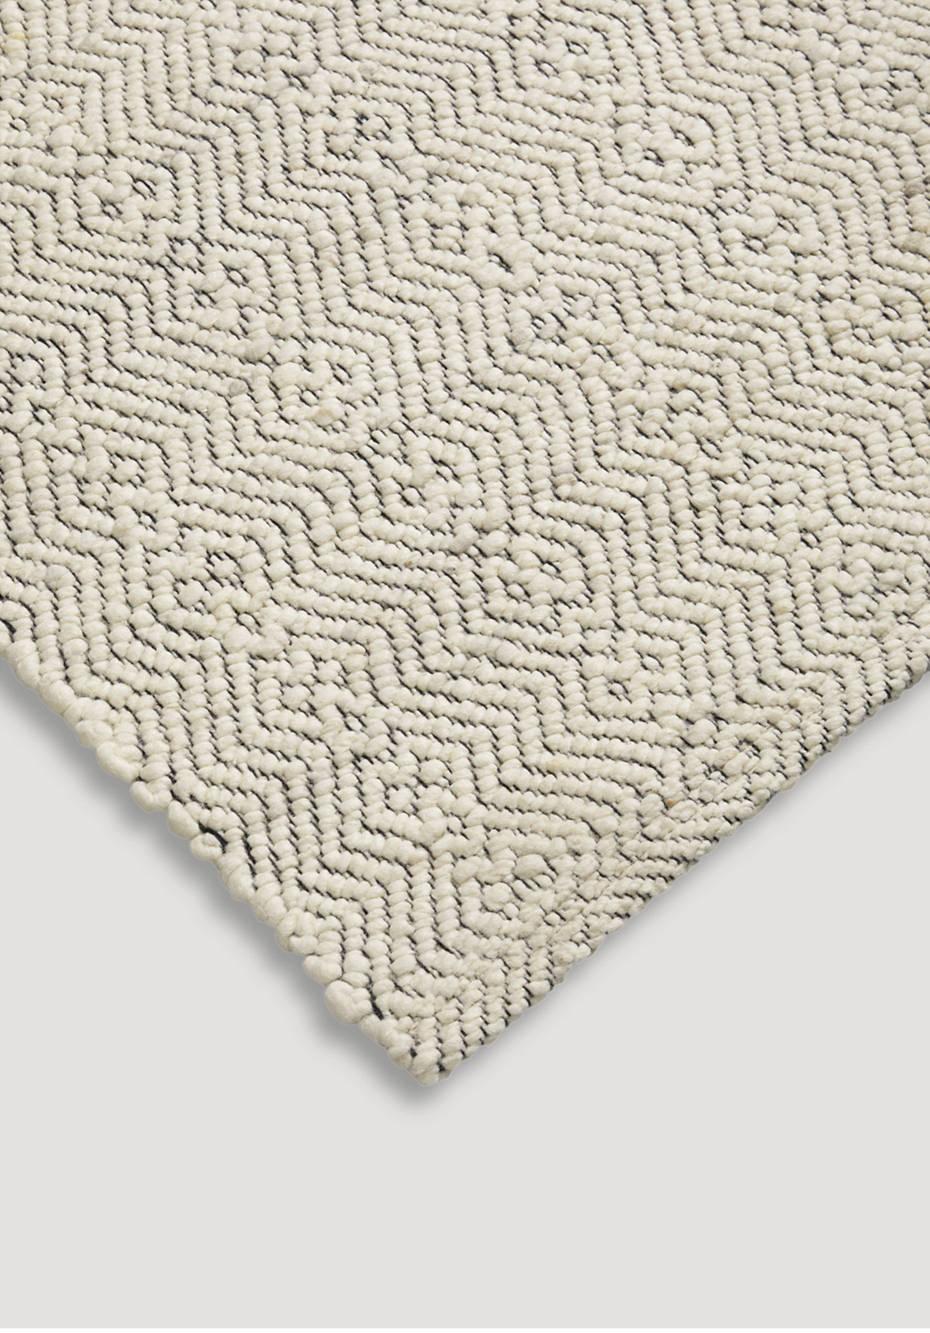 Remsa virgin wool carpet from the dyke sheep